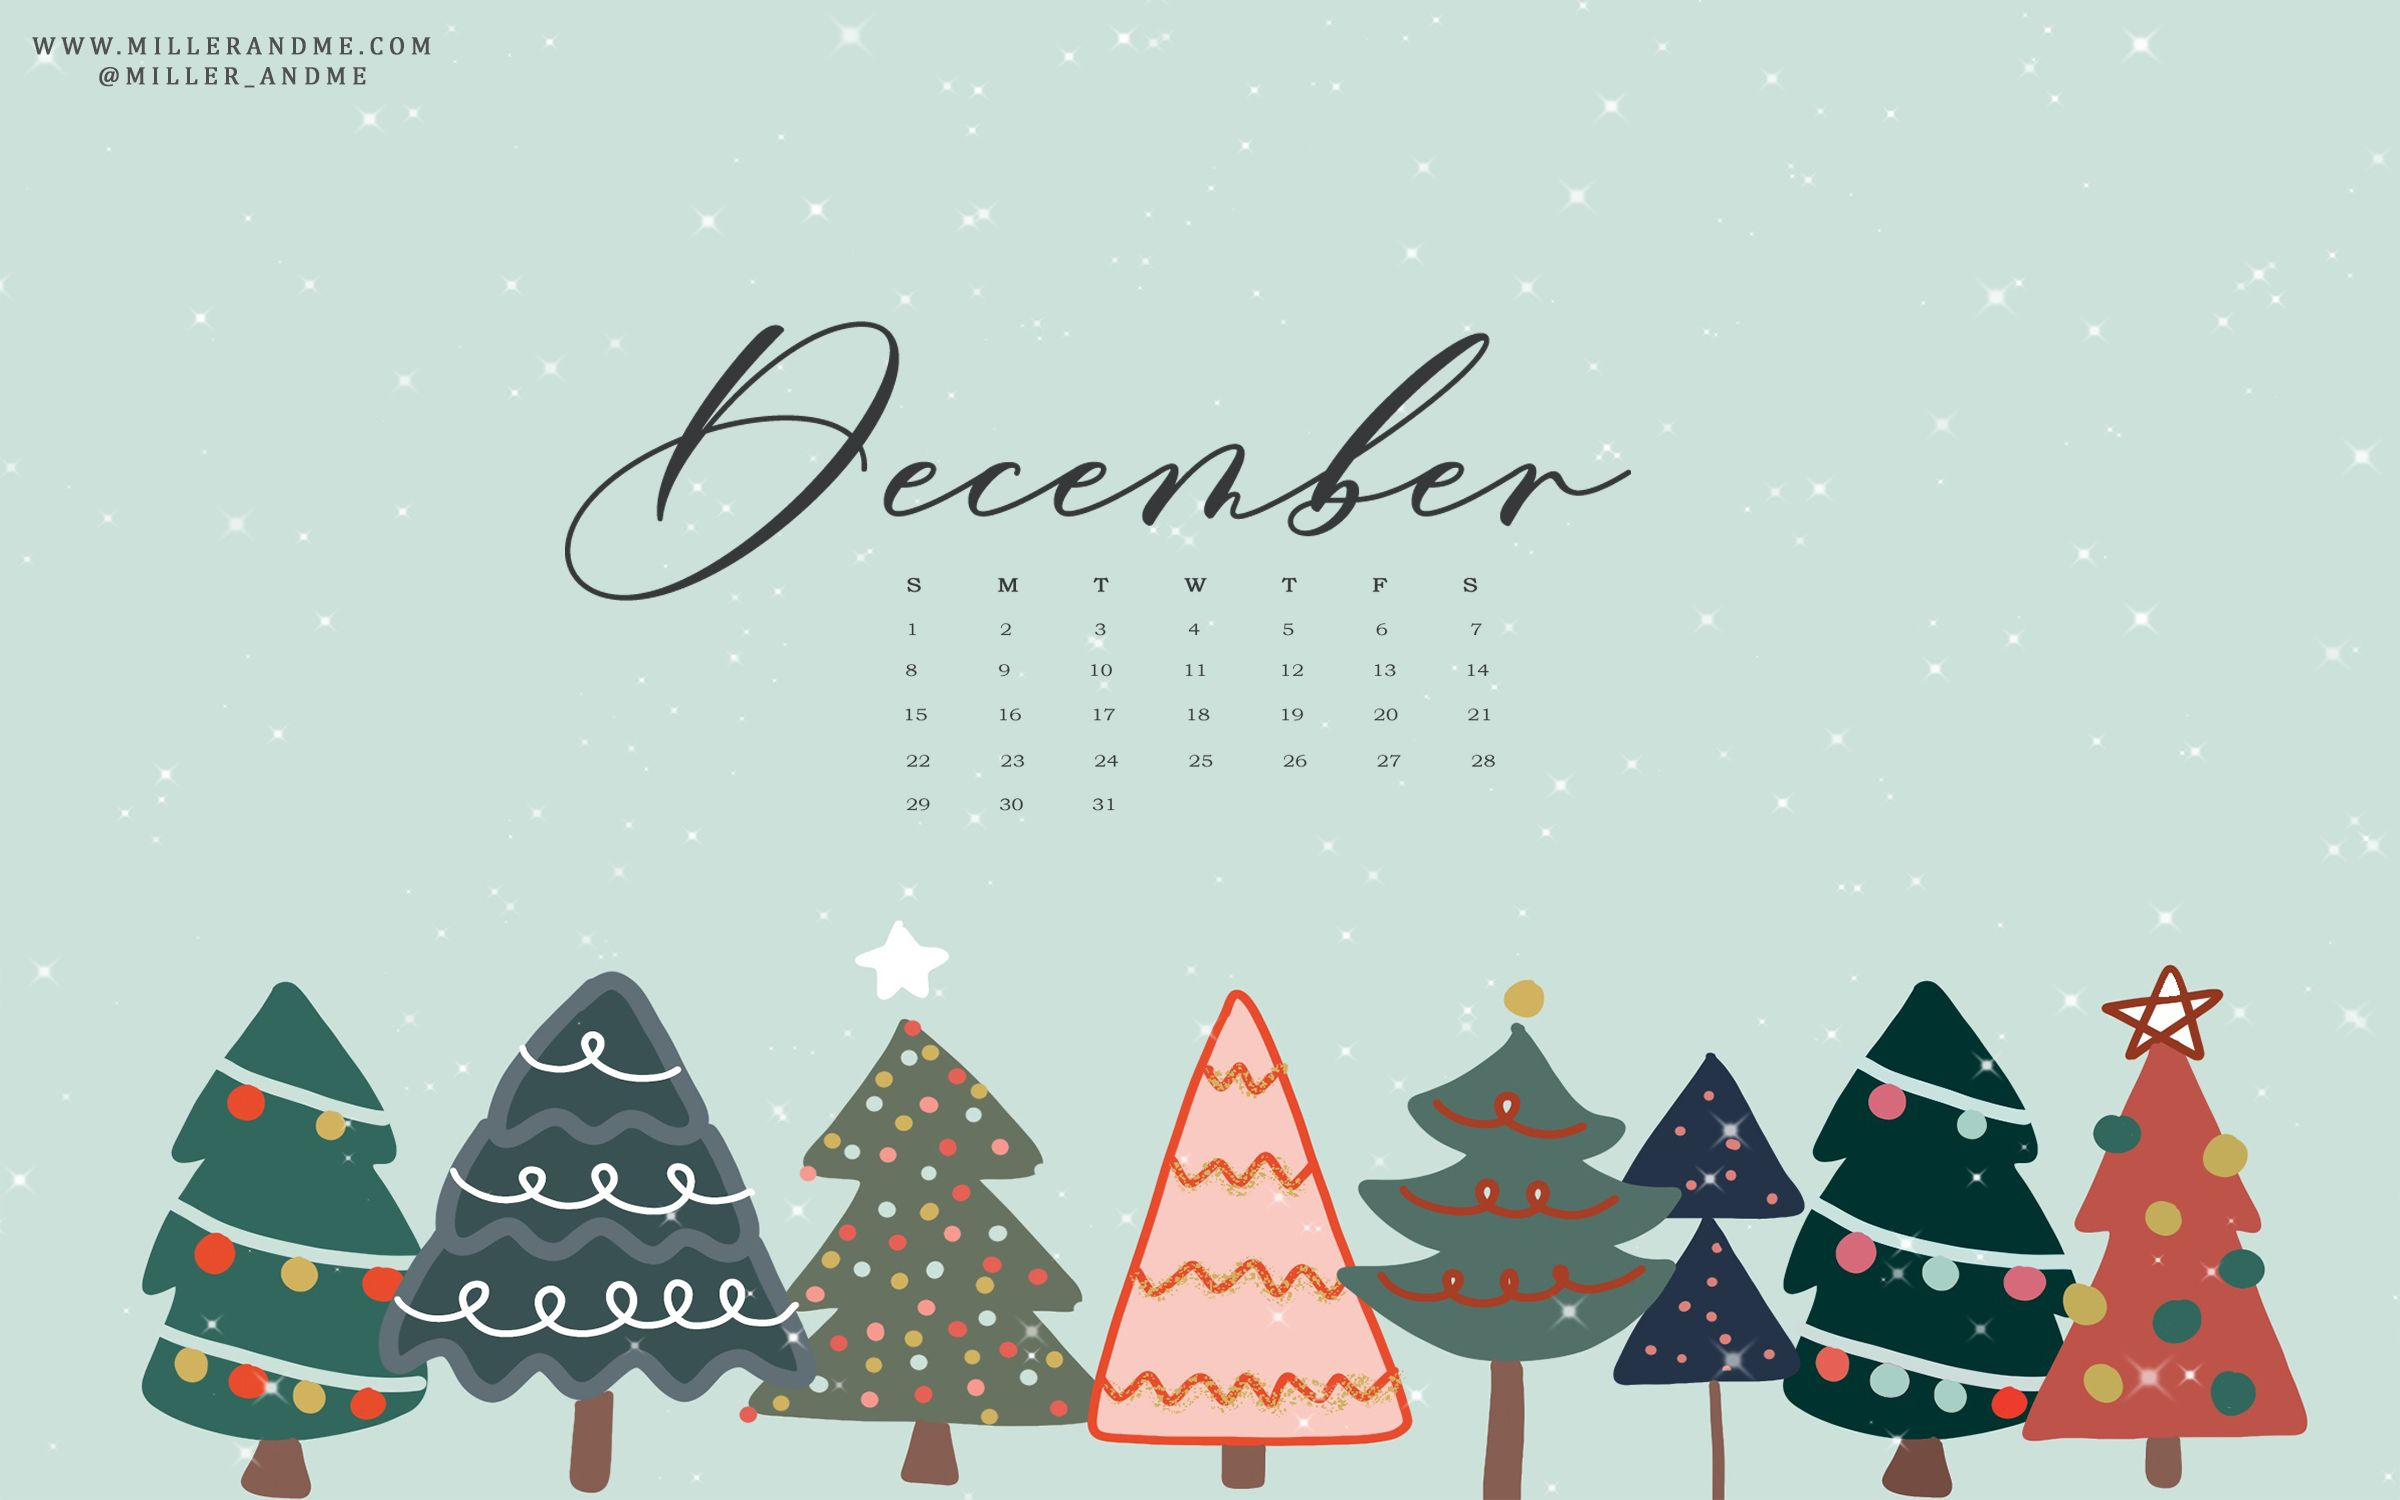 December 2019 Desktop Background Option 1 Miller Me Design Co Wallpaper Iphone Christmas Christmas Desktop Wallpaper Cute Christmas Wallpaper